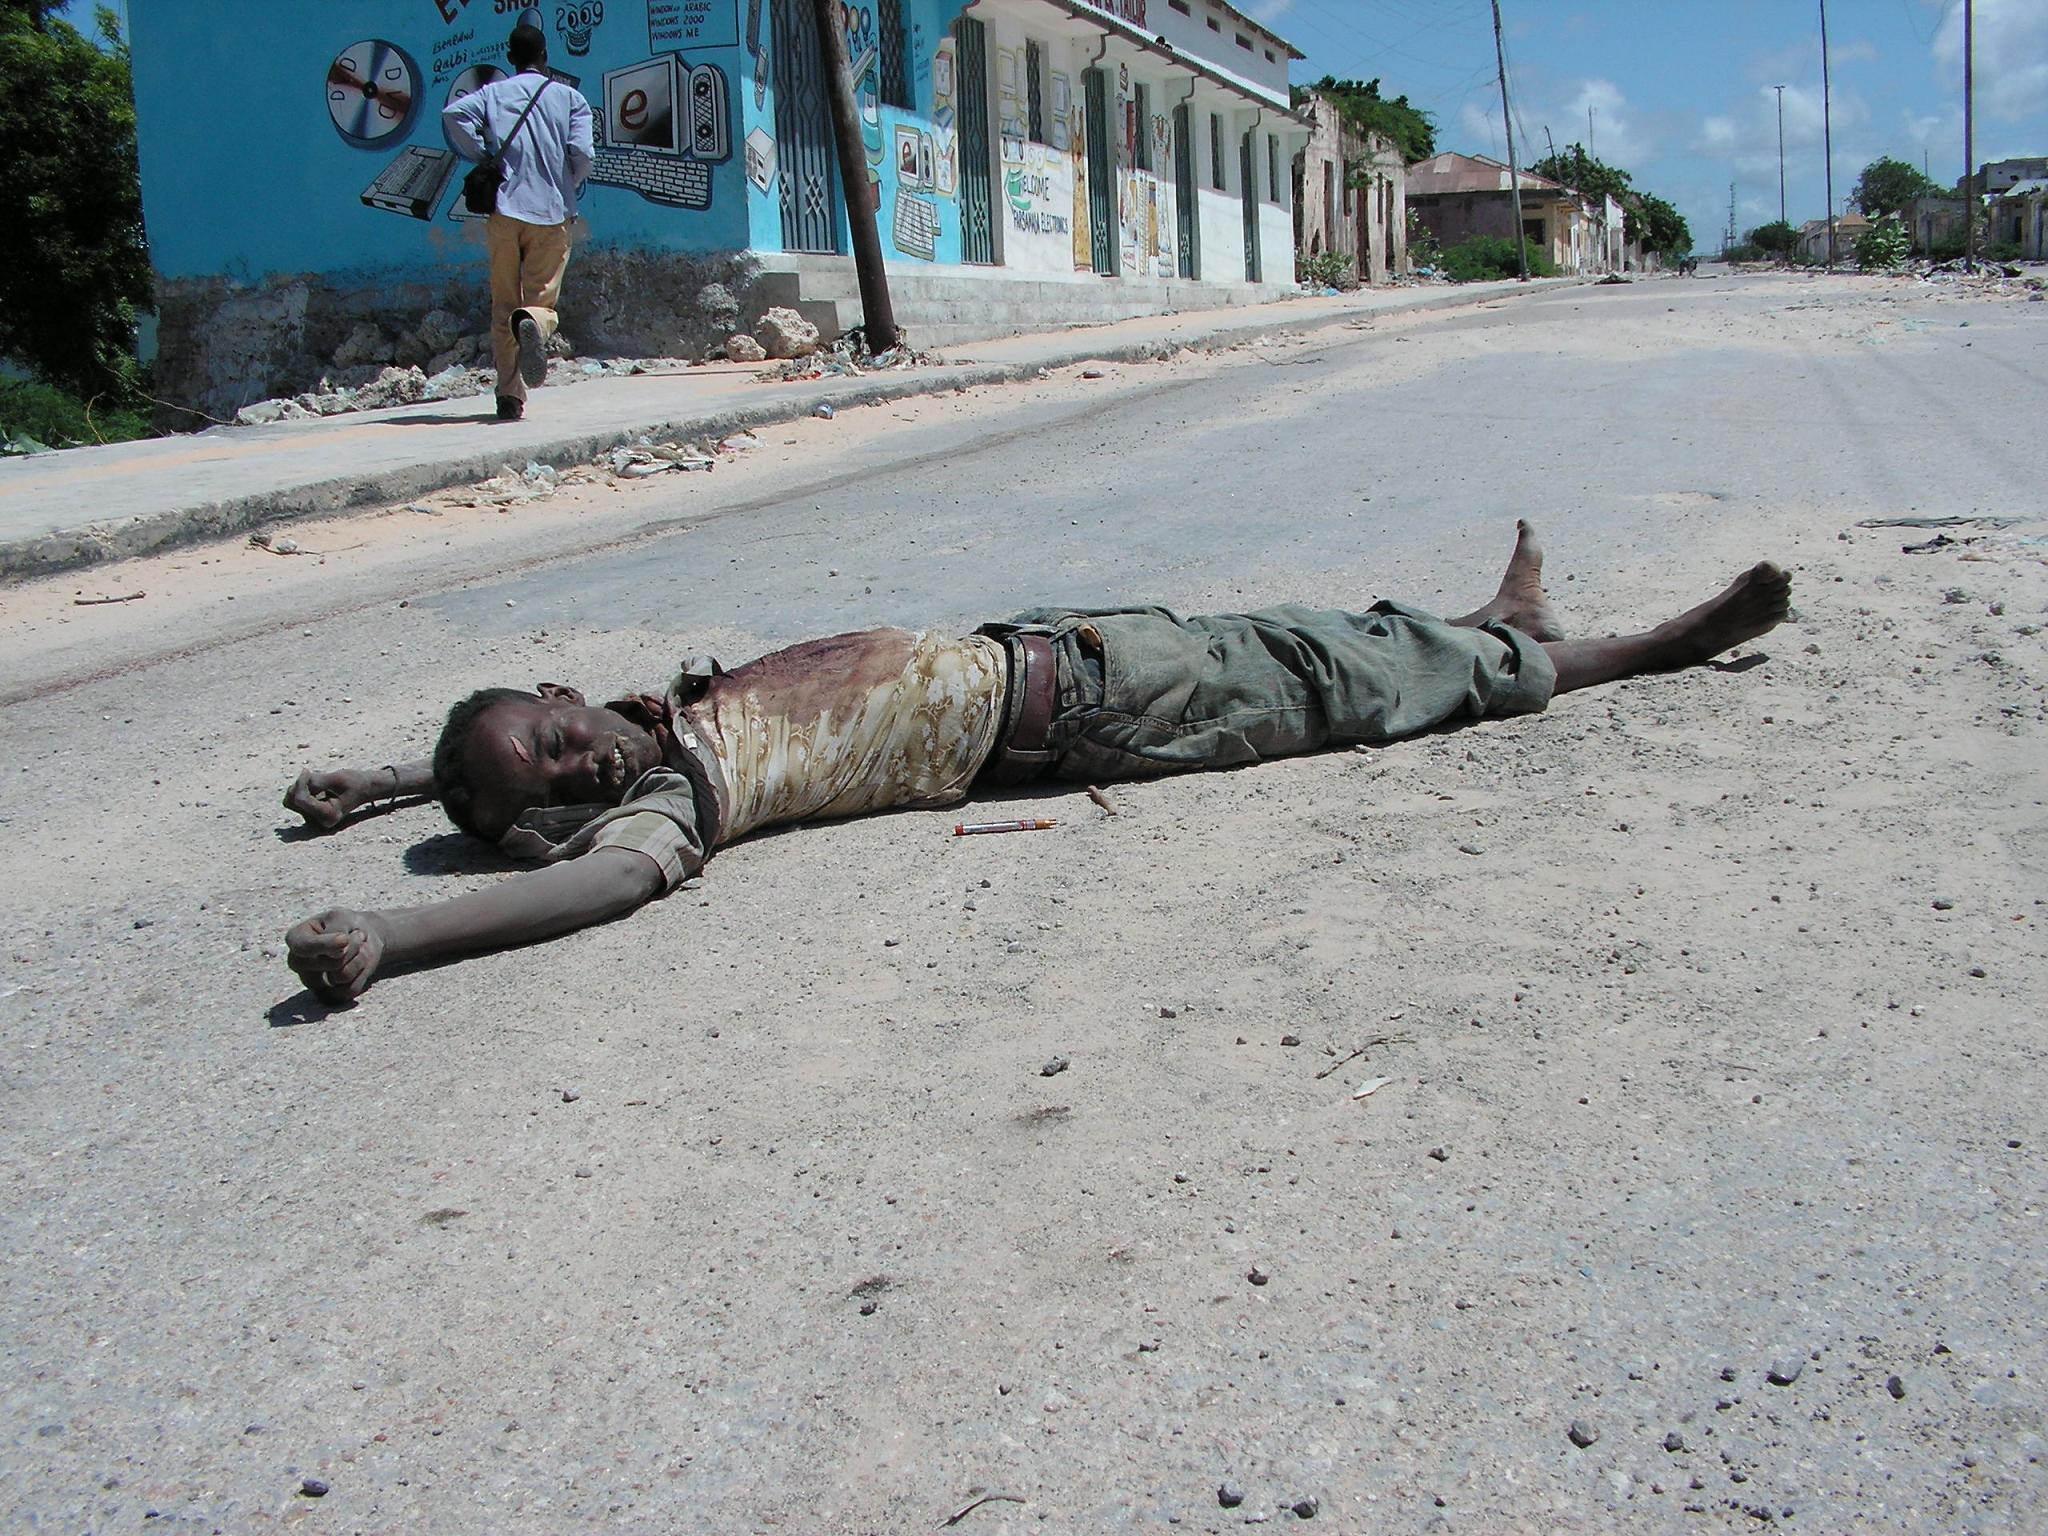 The body of soldier on Wadnaha Road, Sinai area, Mogadishu